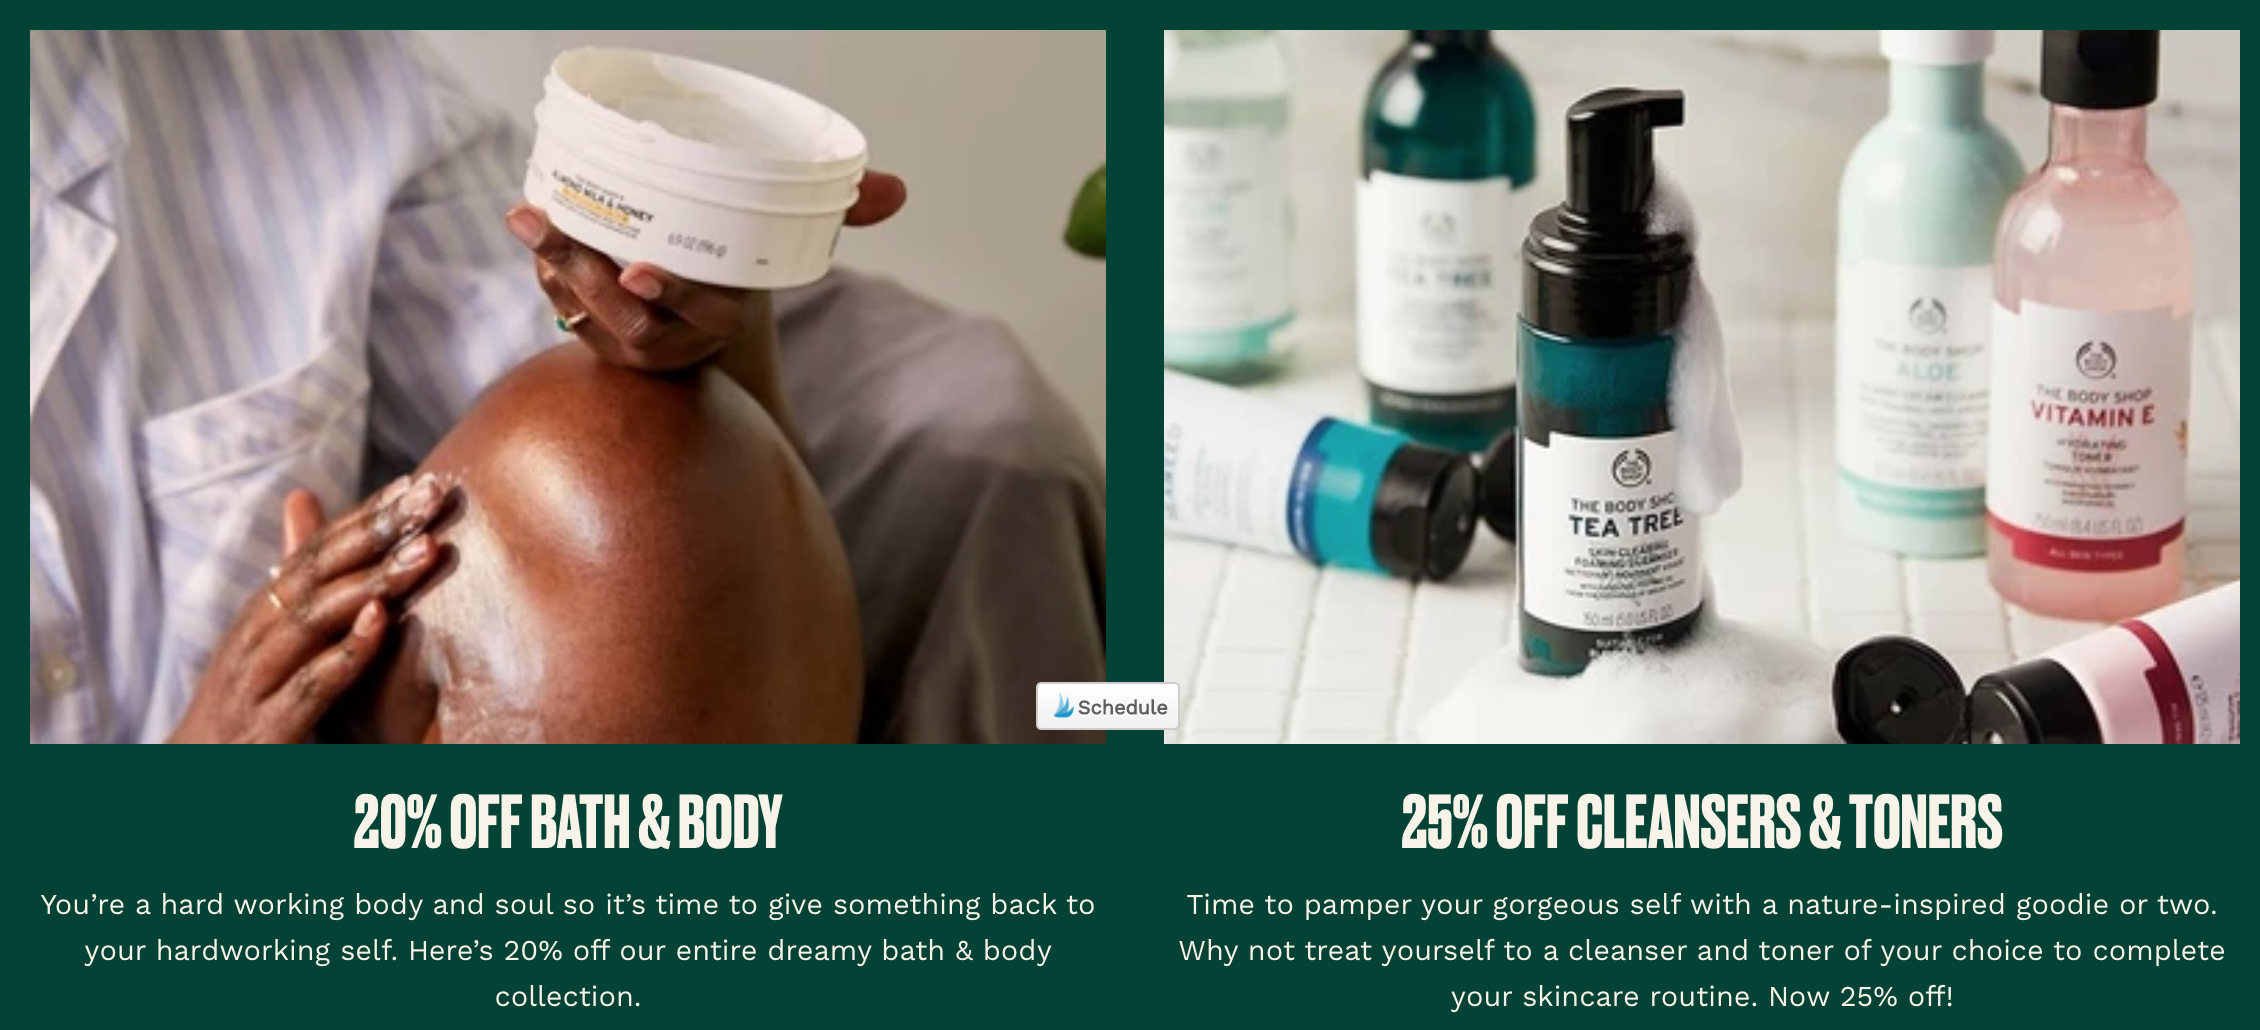 the body shop coupon code